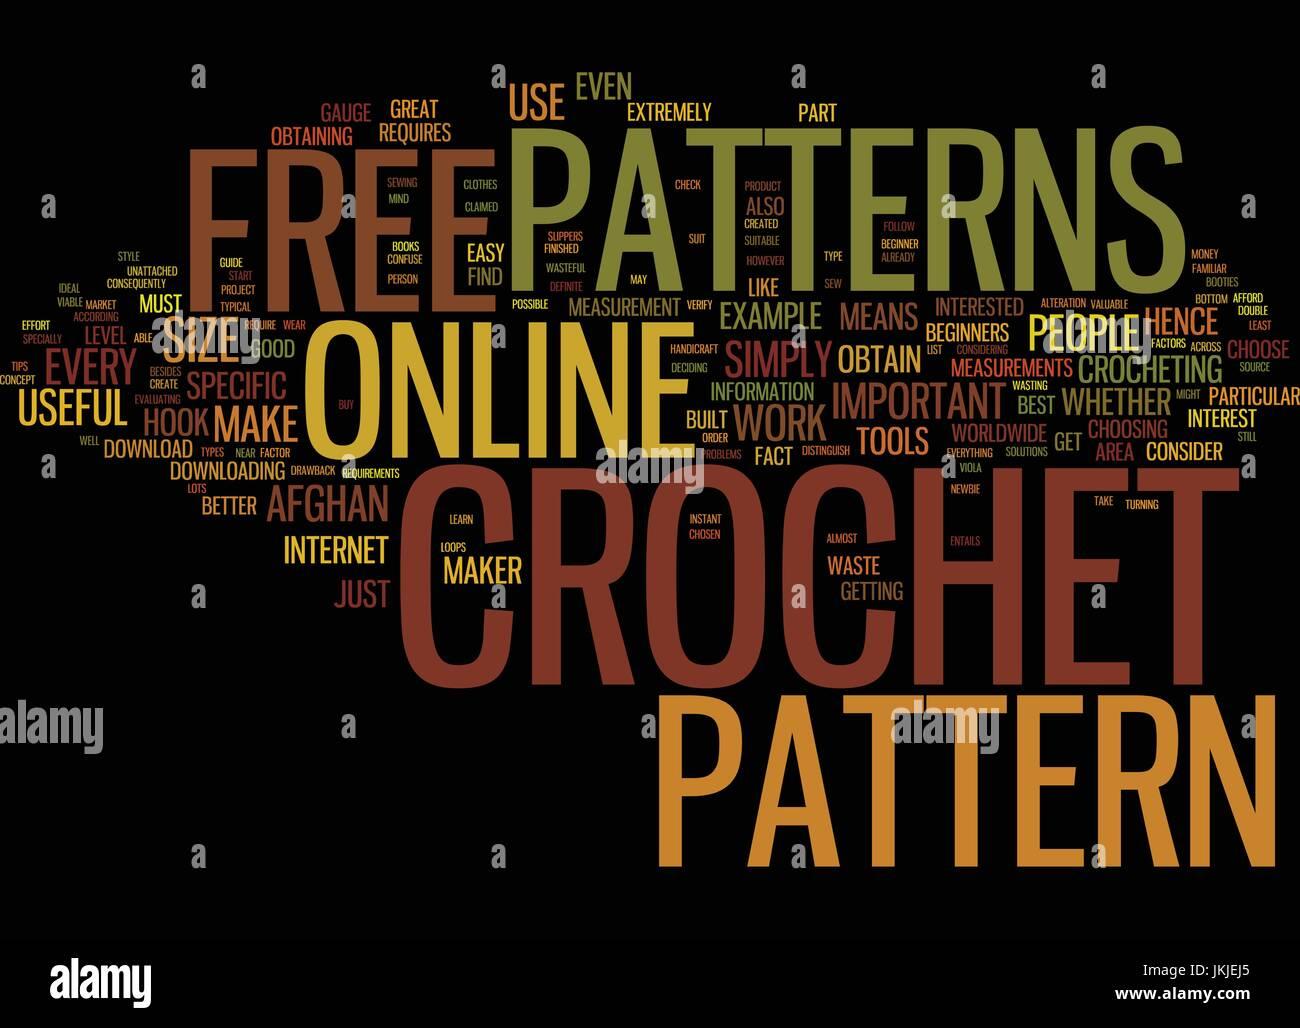 Crochet Patterns Text Background Word Stockfotos & Crochet Patterns ...